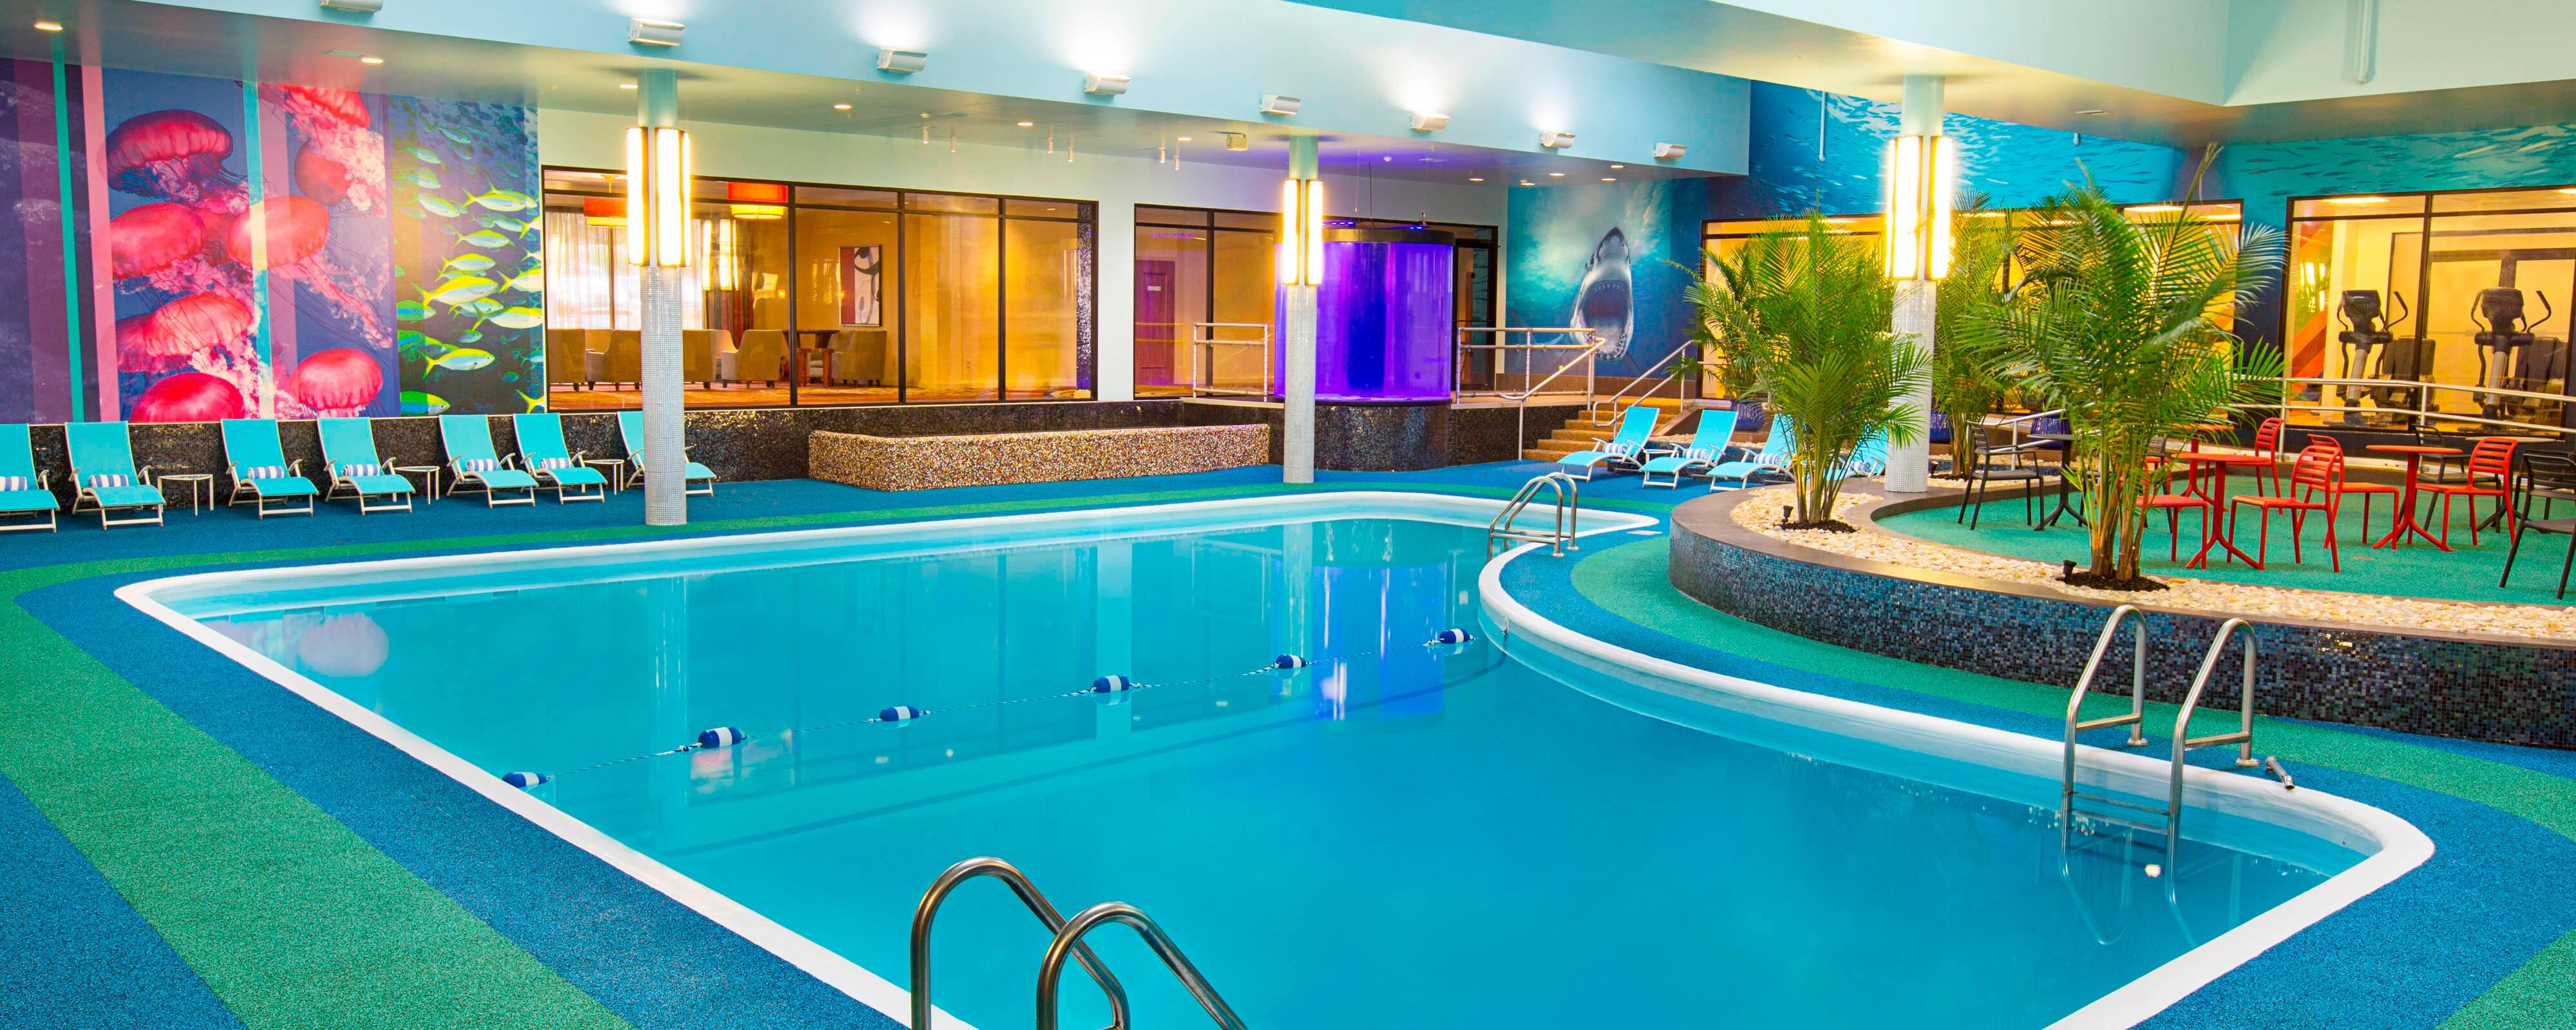 The Reef Beach Club & Pool